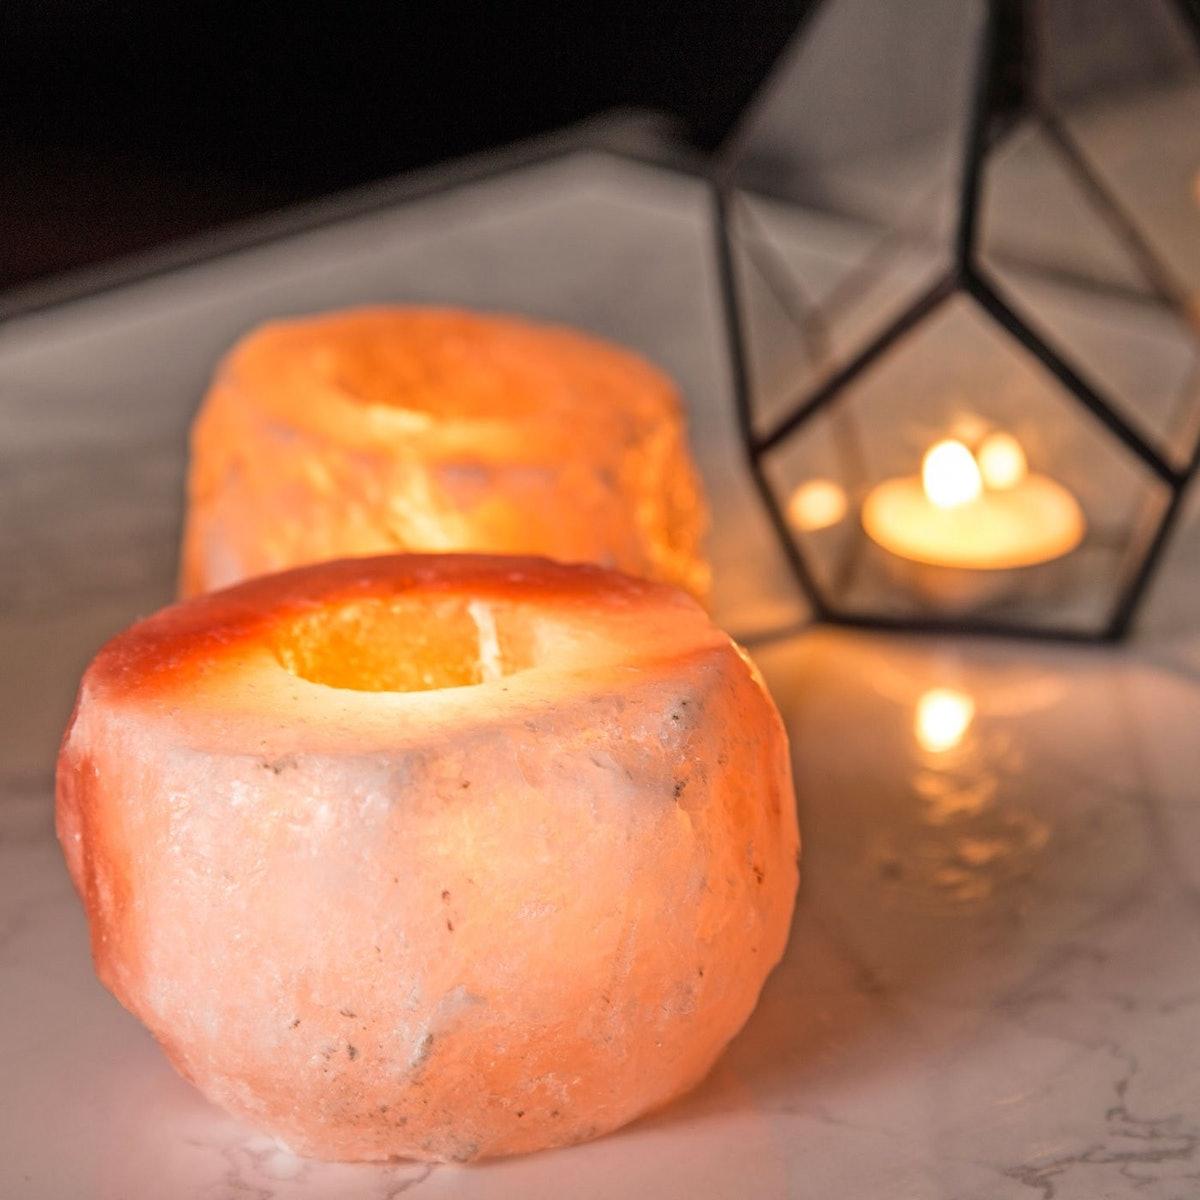 Crystal Allies Himalayan Salt Tea Light Candle Holders (2 Pack)